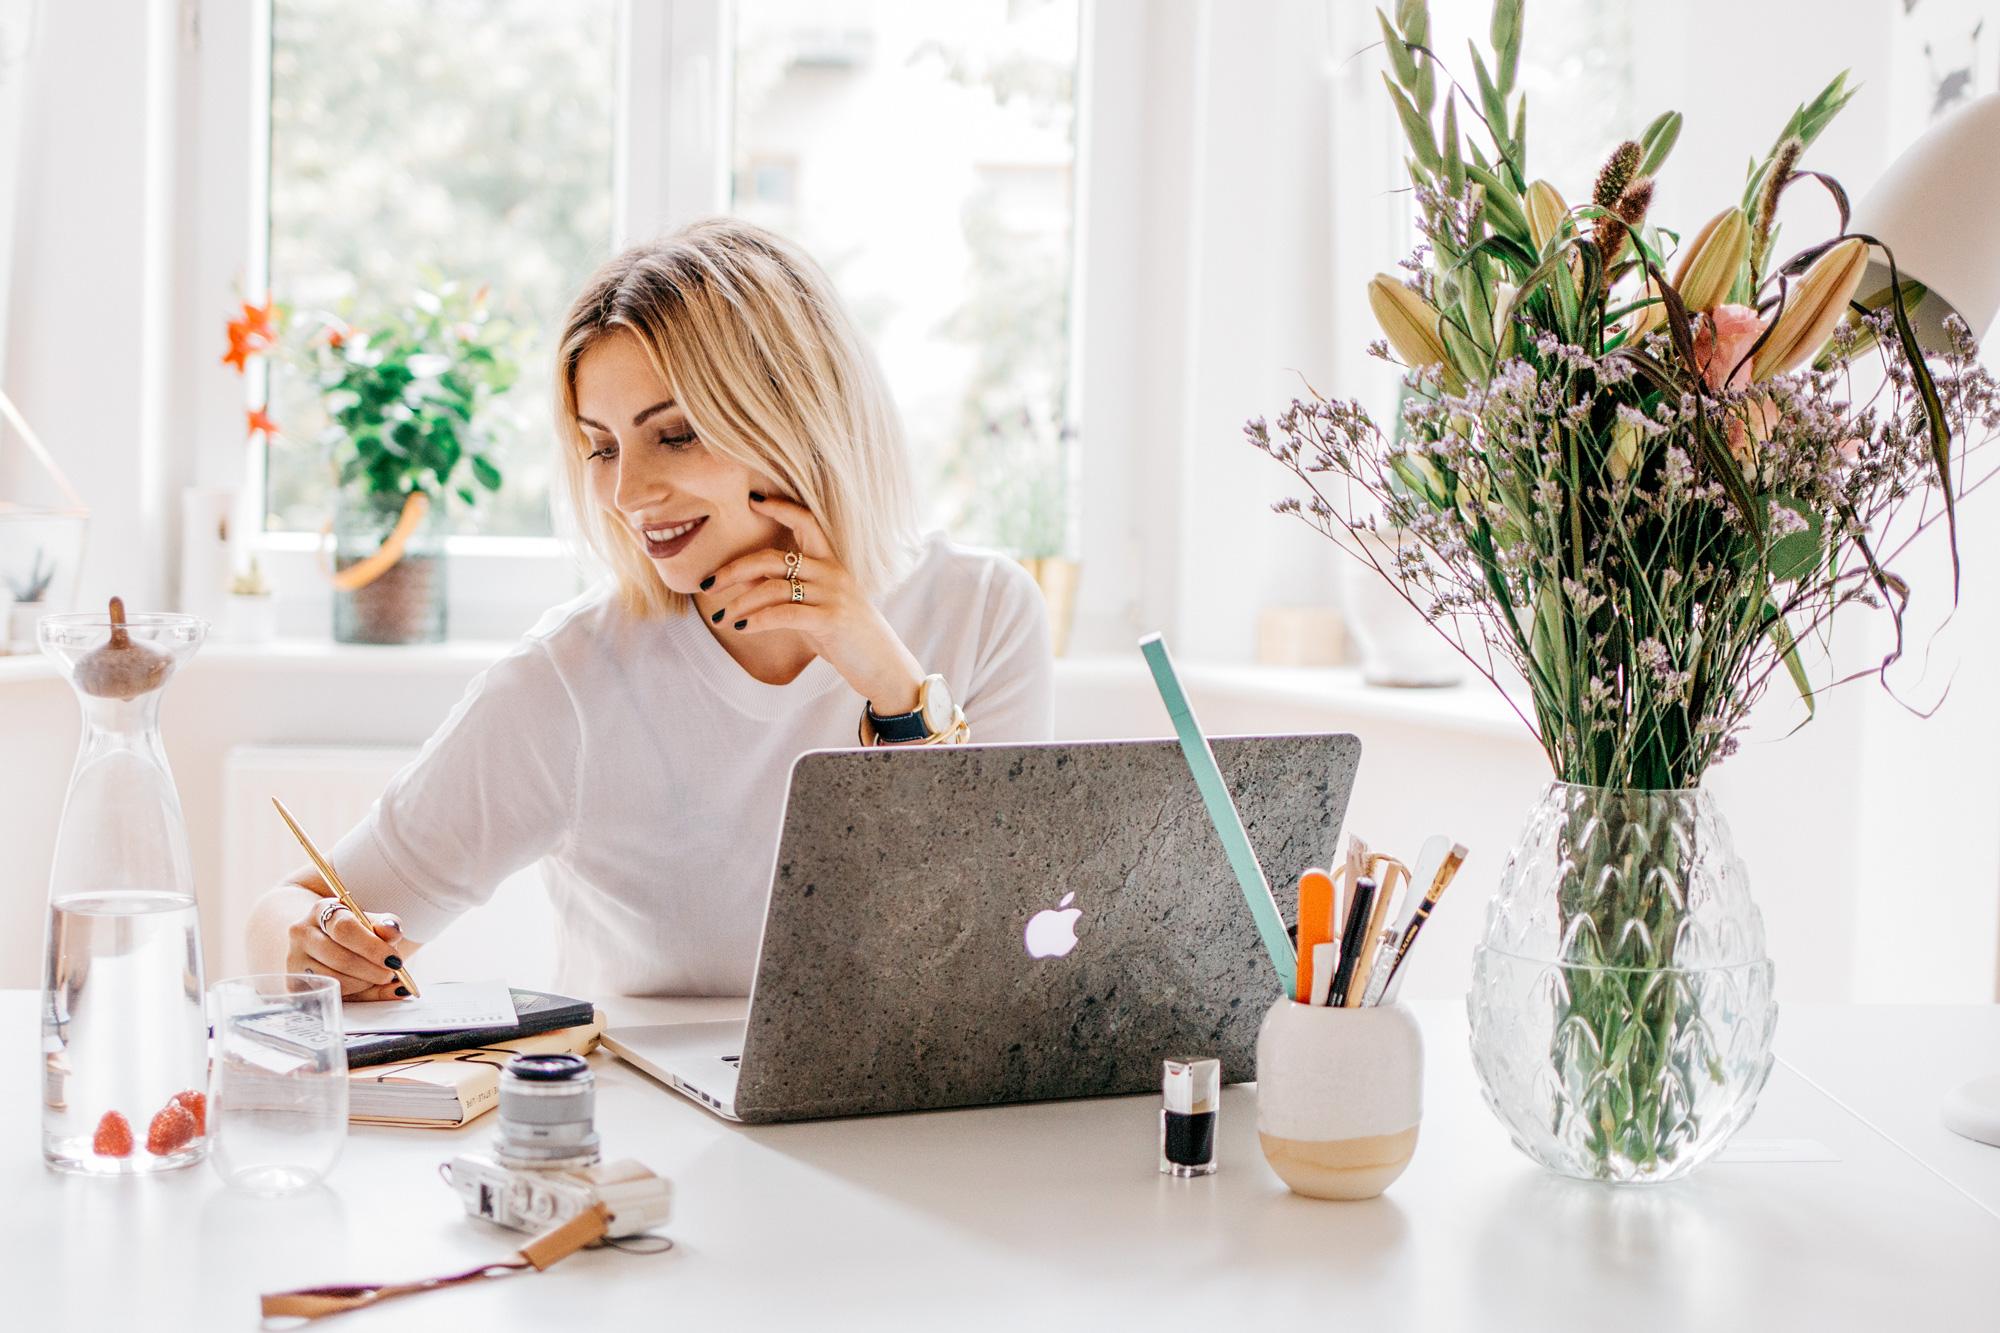 blogger-work-2